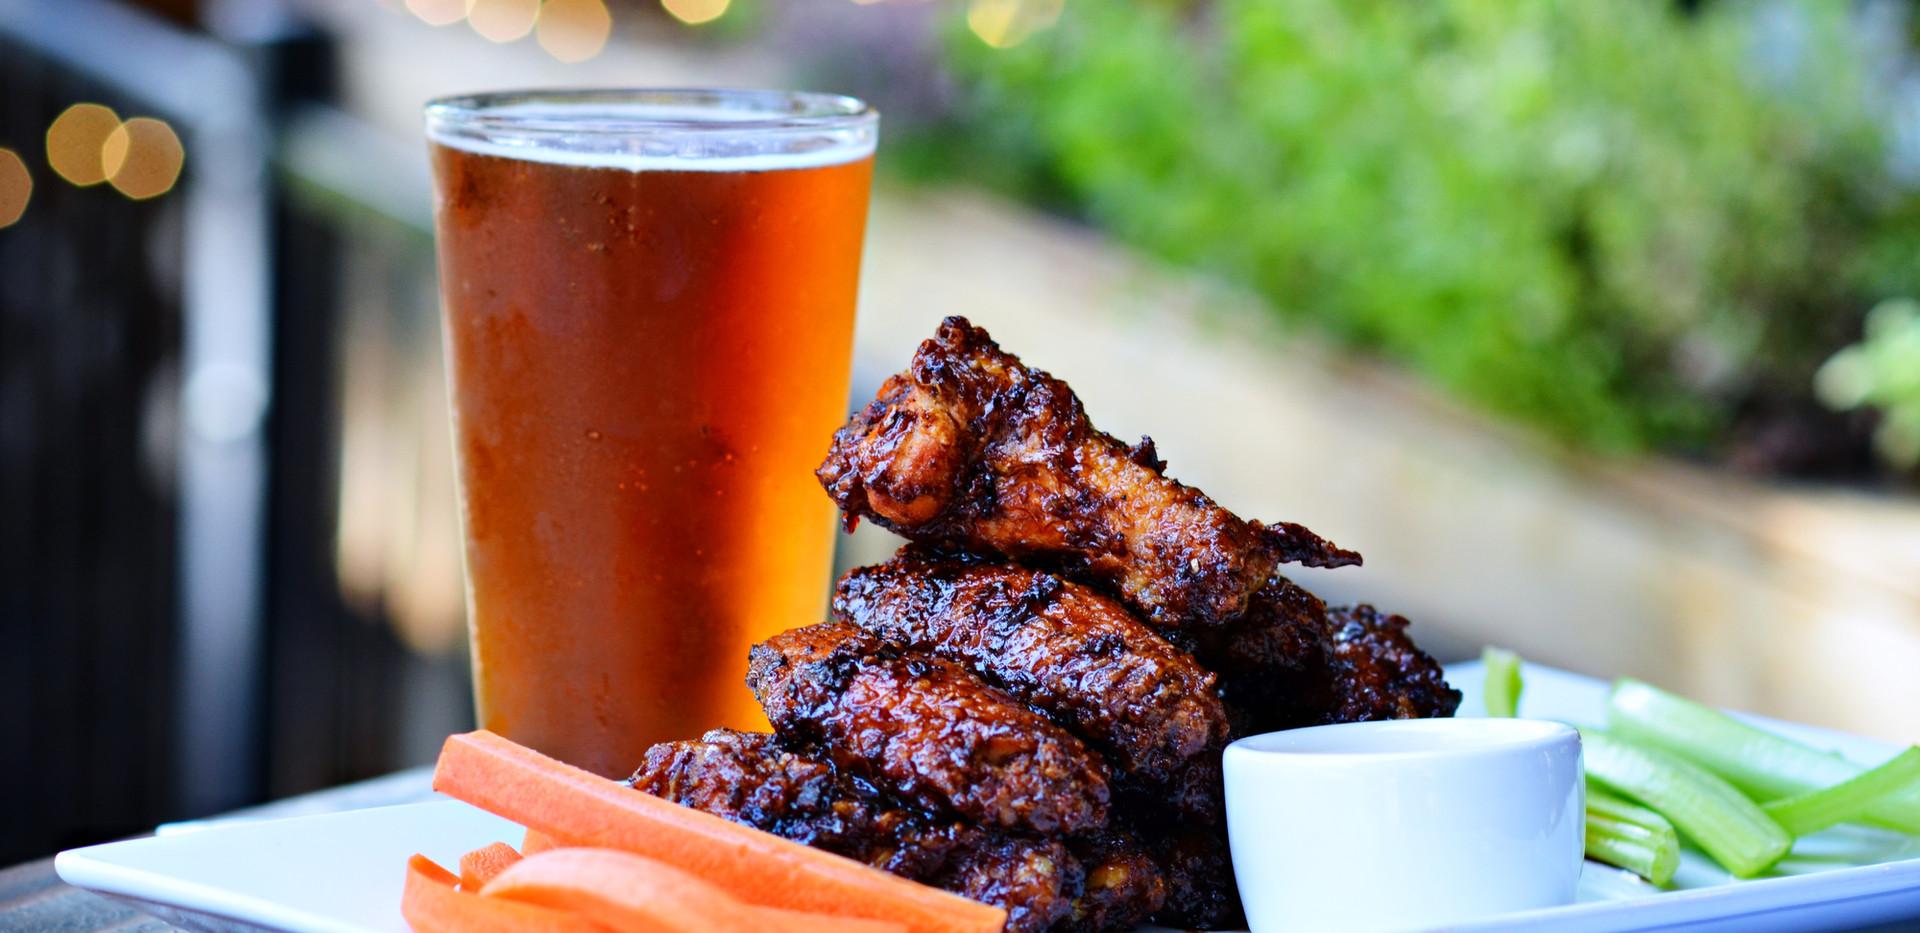 The Tin Lantern Bar & Grill. Sarah Nolivo. Marcello Nolivo. Beer. Meadow Vista, CA.